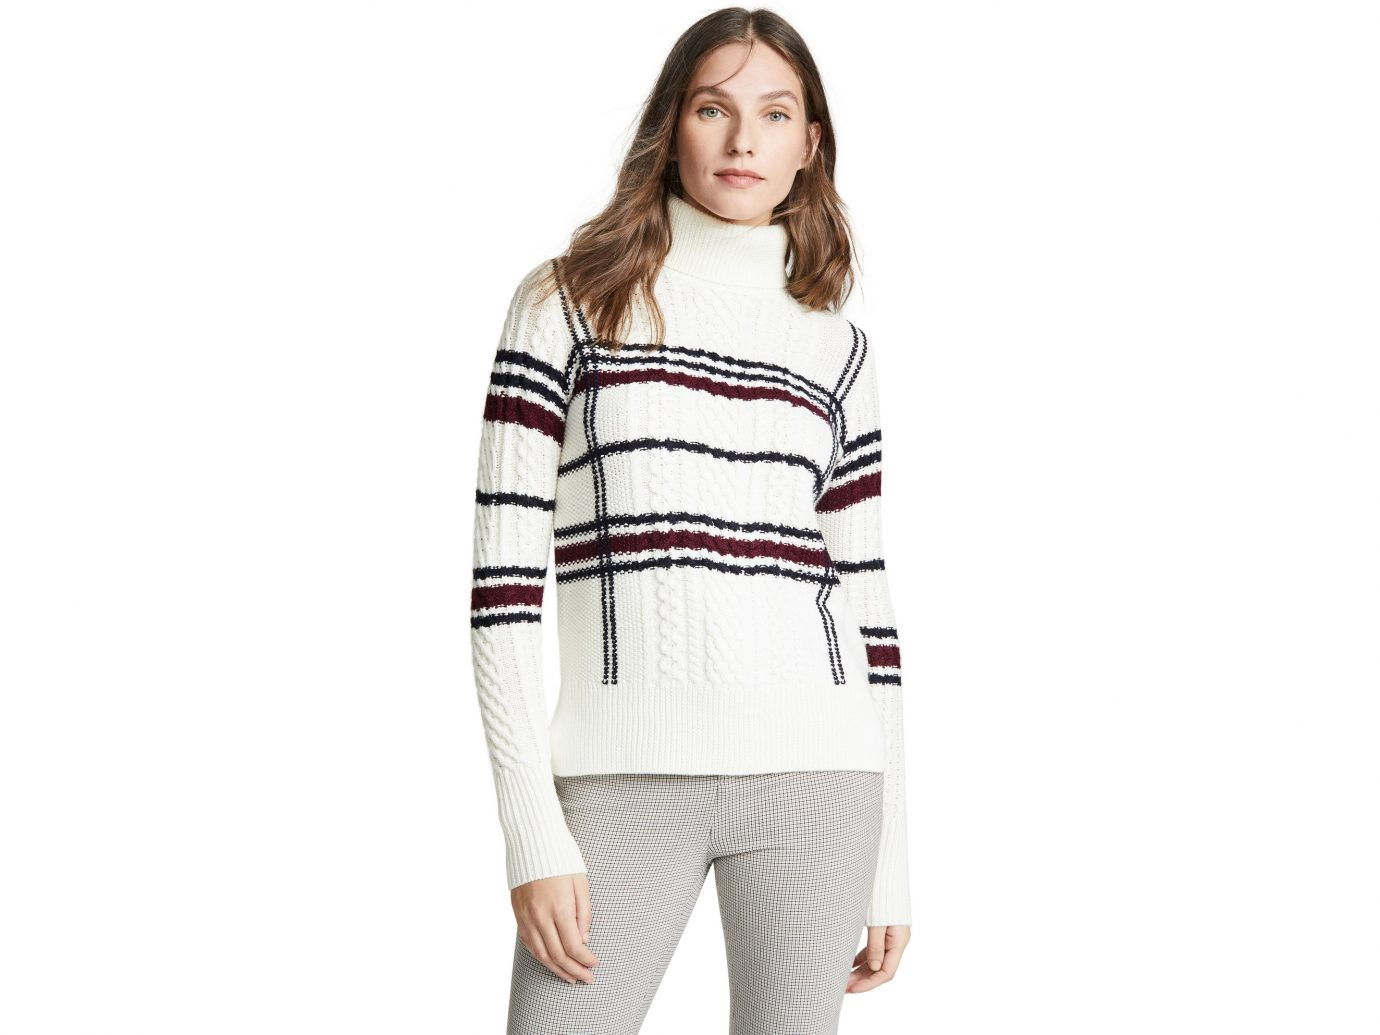 Joie Ashlisa Wool Turtleneck Sweater